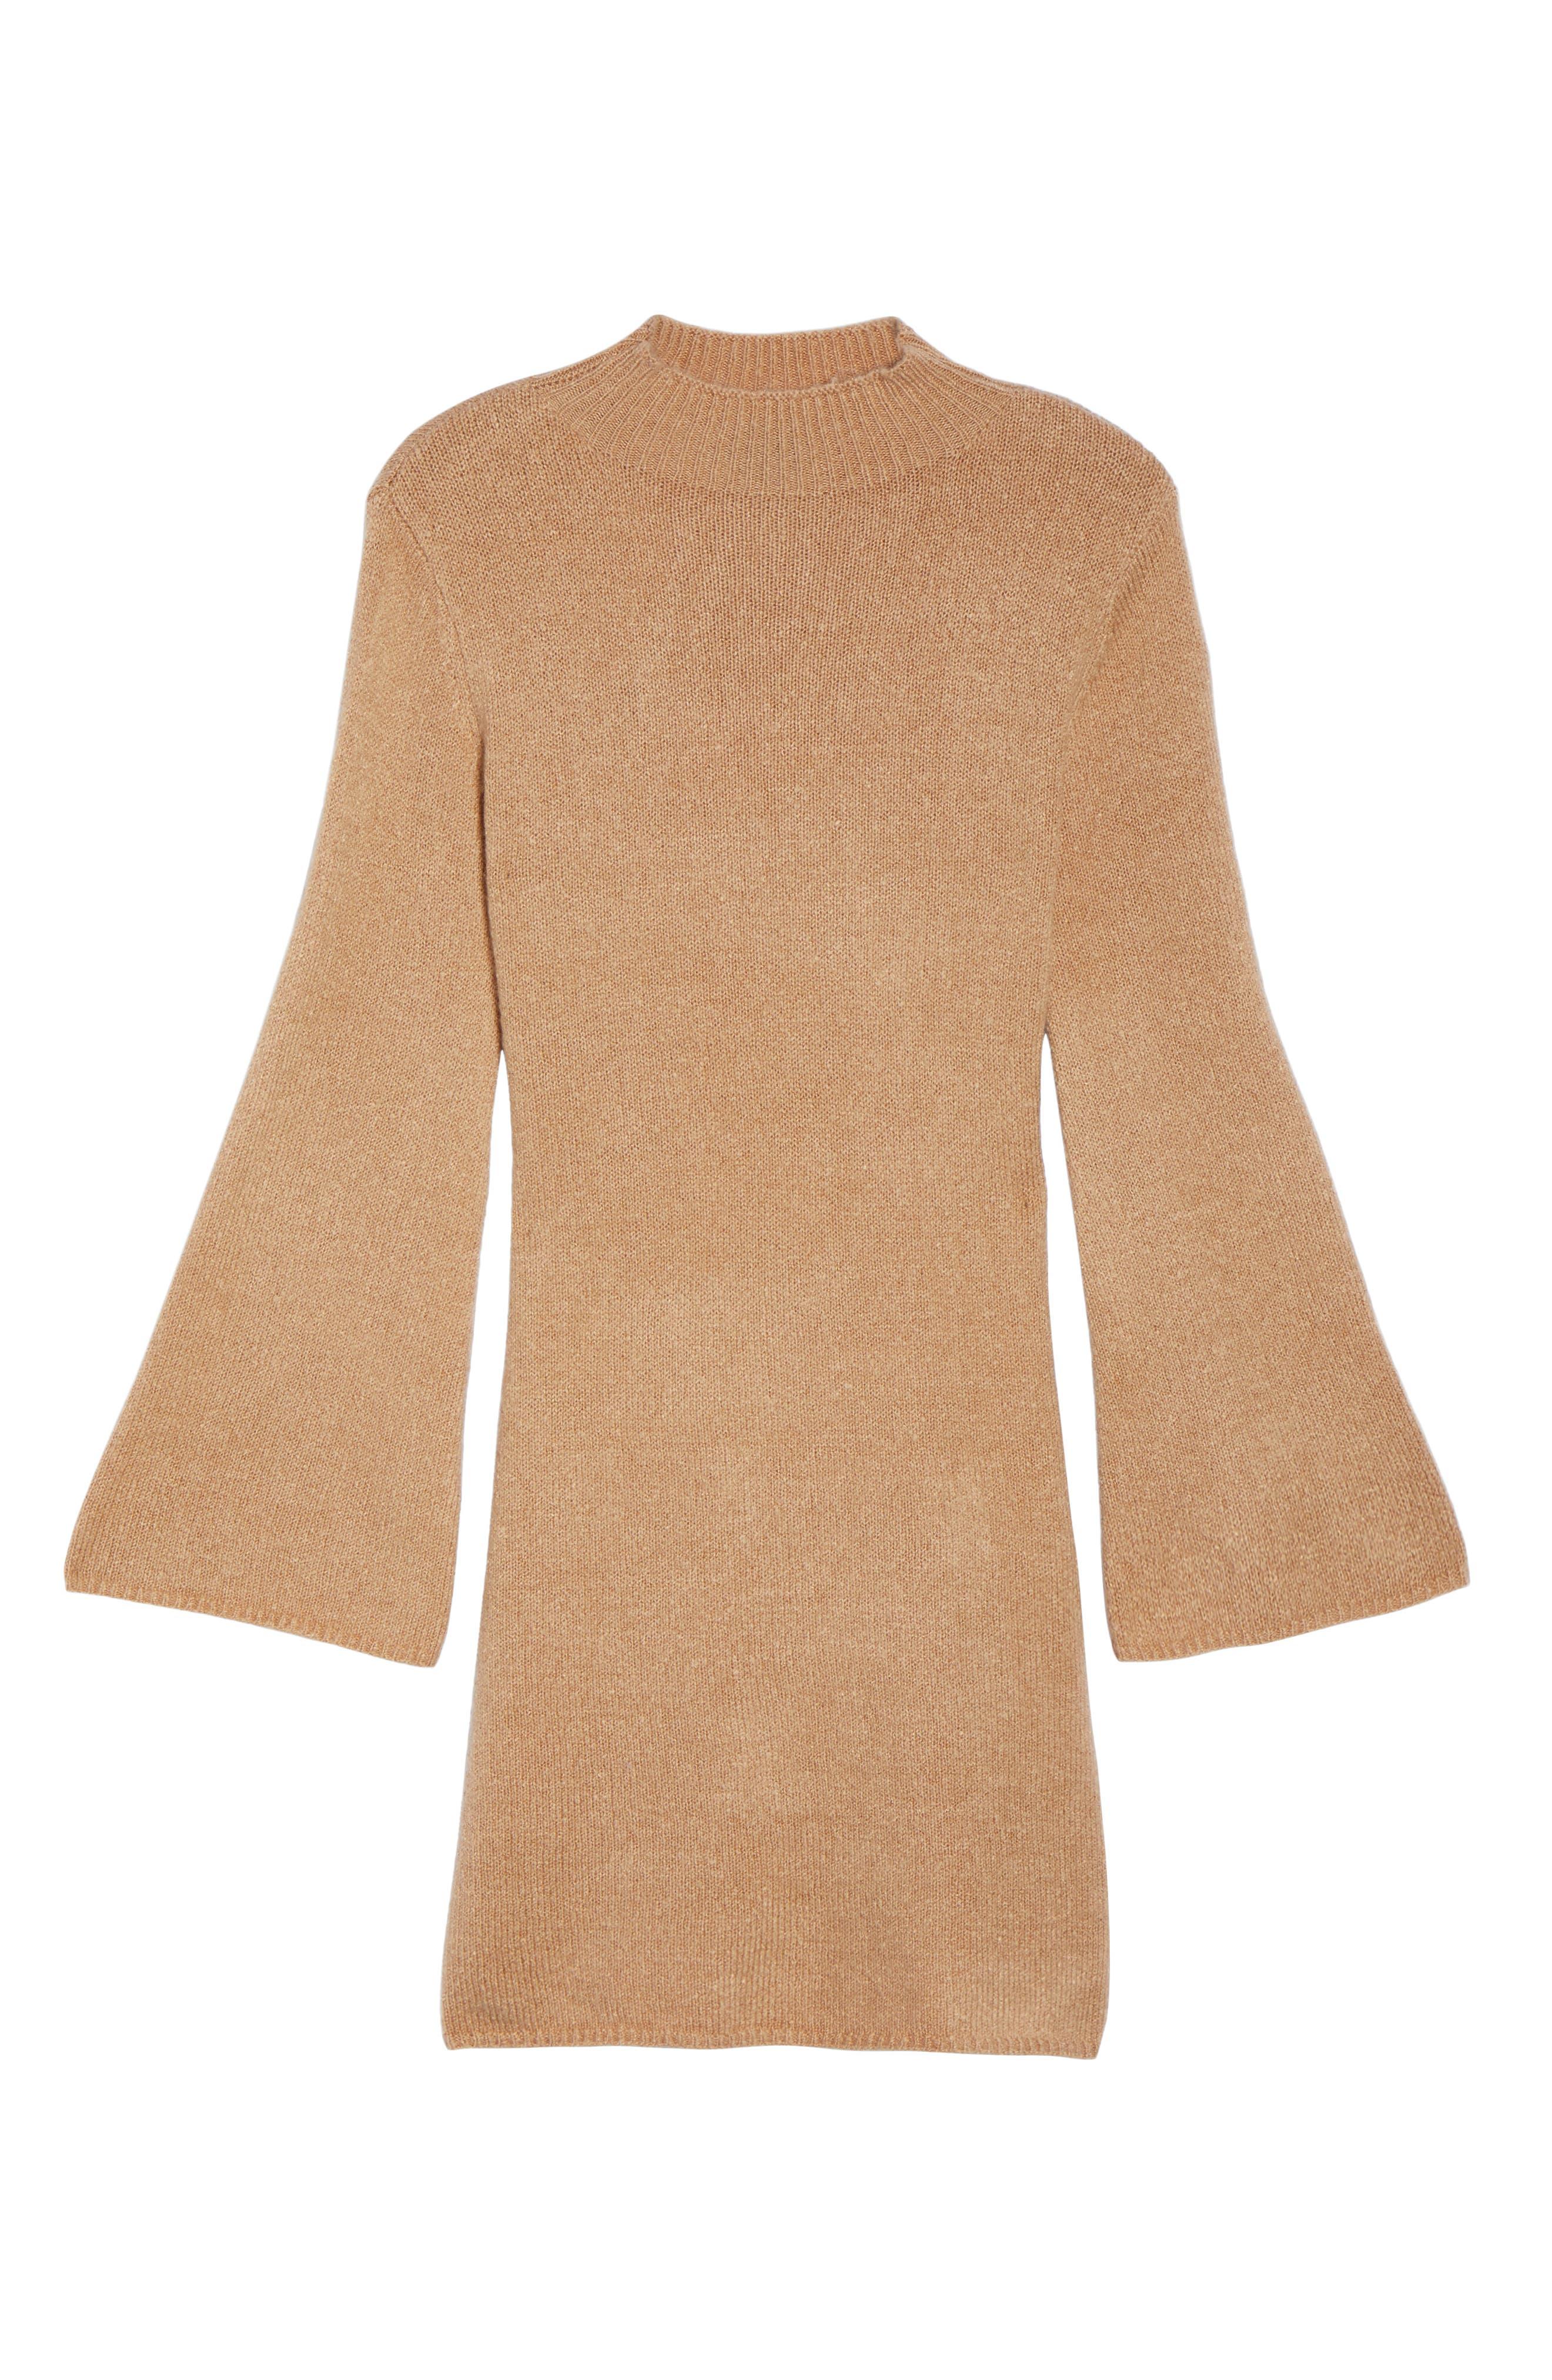 Bell Sleeve Knit Dress,                             Alternate thumbnail 6, color,                             208